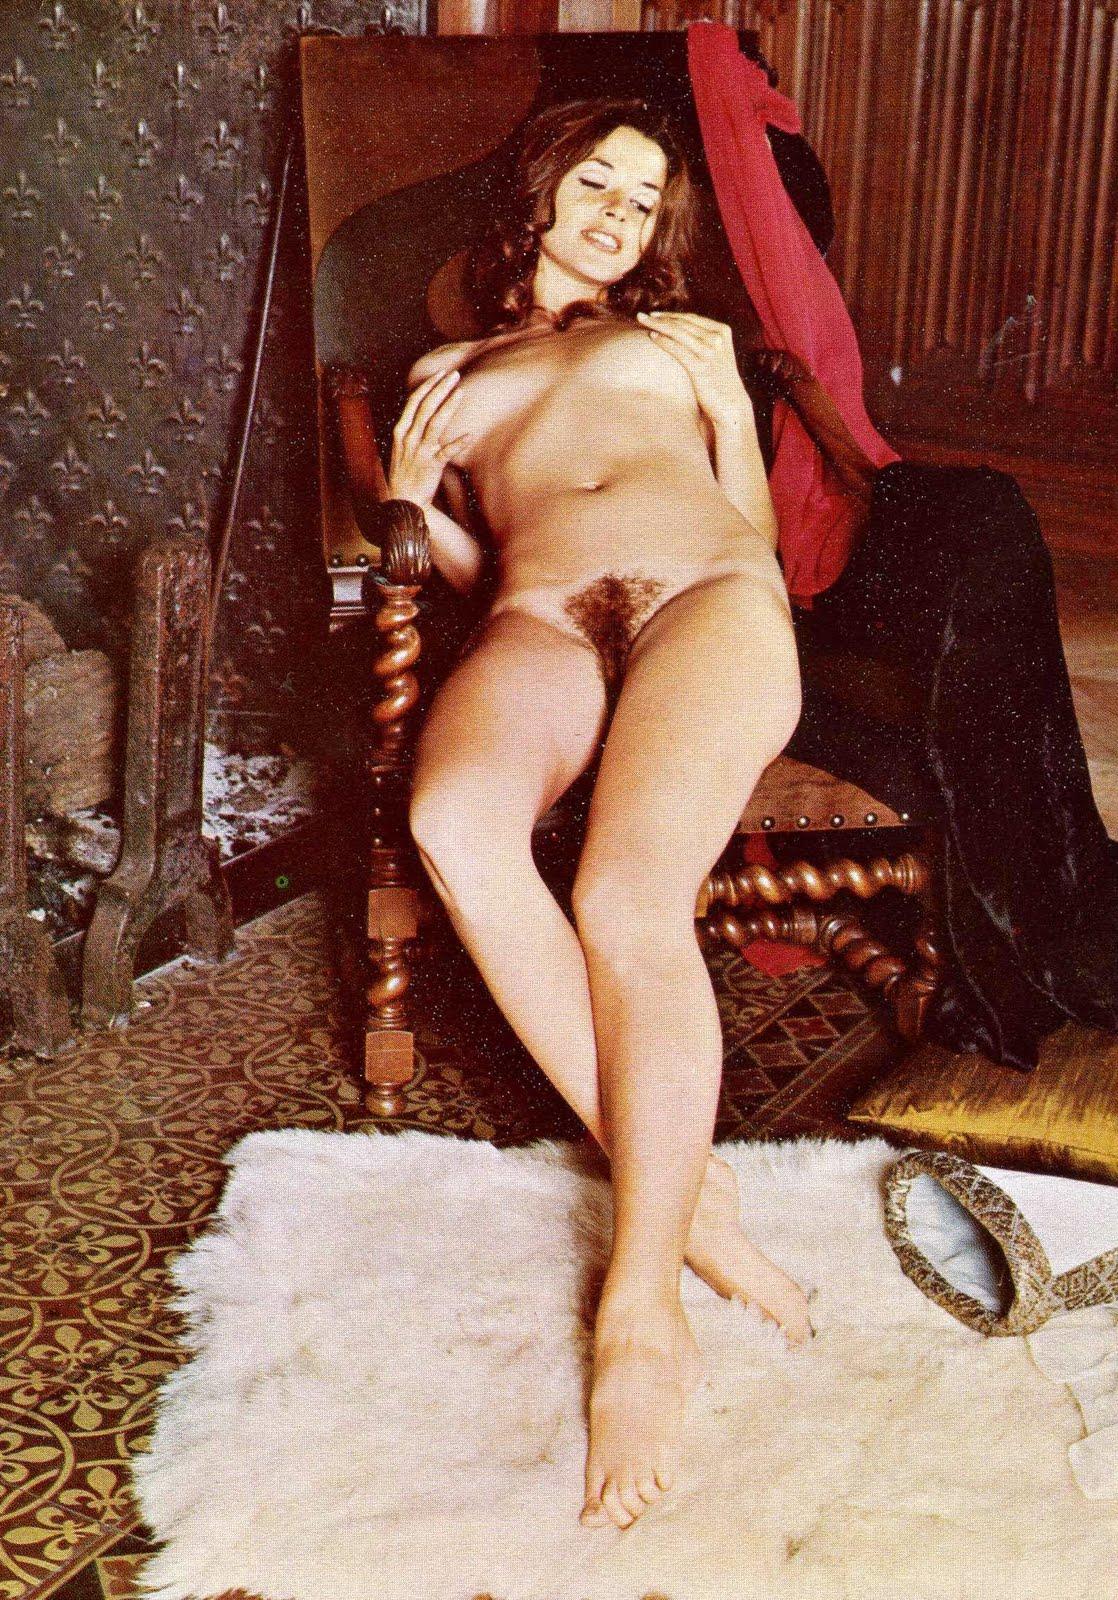 http://2.bp.blogspot.com/_EU5AVlPYiKM/TBIvwFaR7fI/AAAAAAAAHIc/UZgVhcr1xRE/s1600/Joelle+Coeur+4+in+Chick+69.jpg